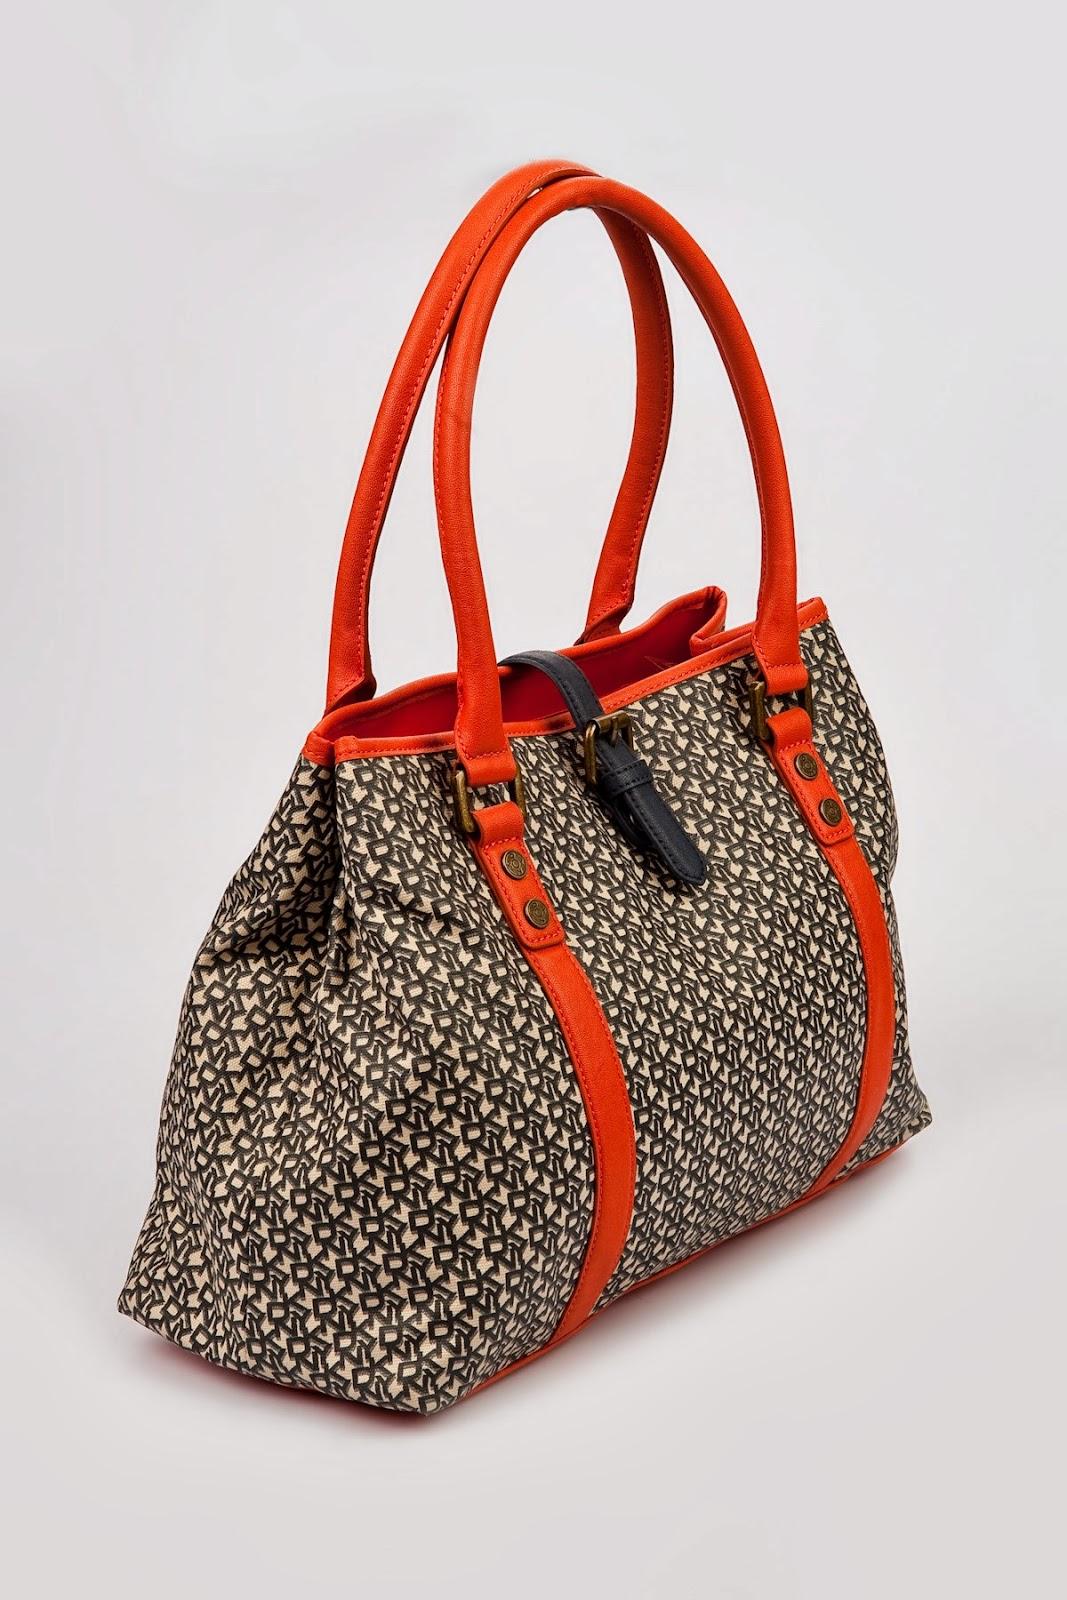 DKNY Spring Summer 2014 Handbags Models,KNY bags,DKNY ...